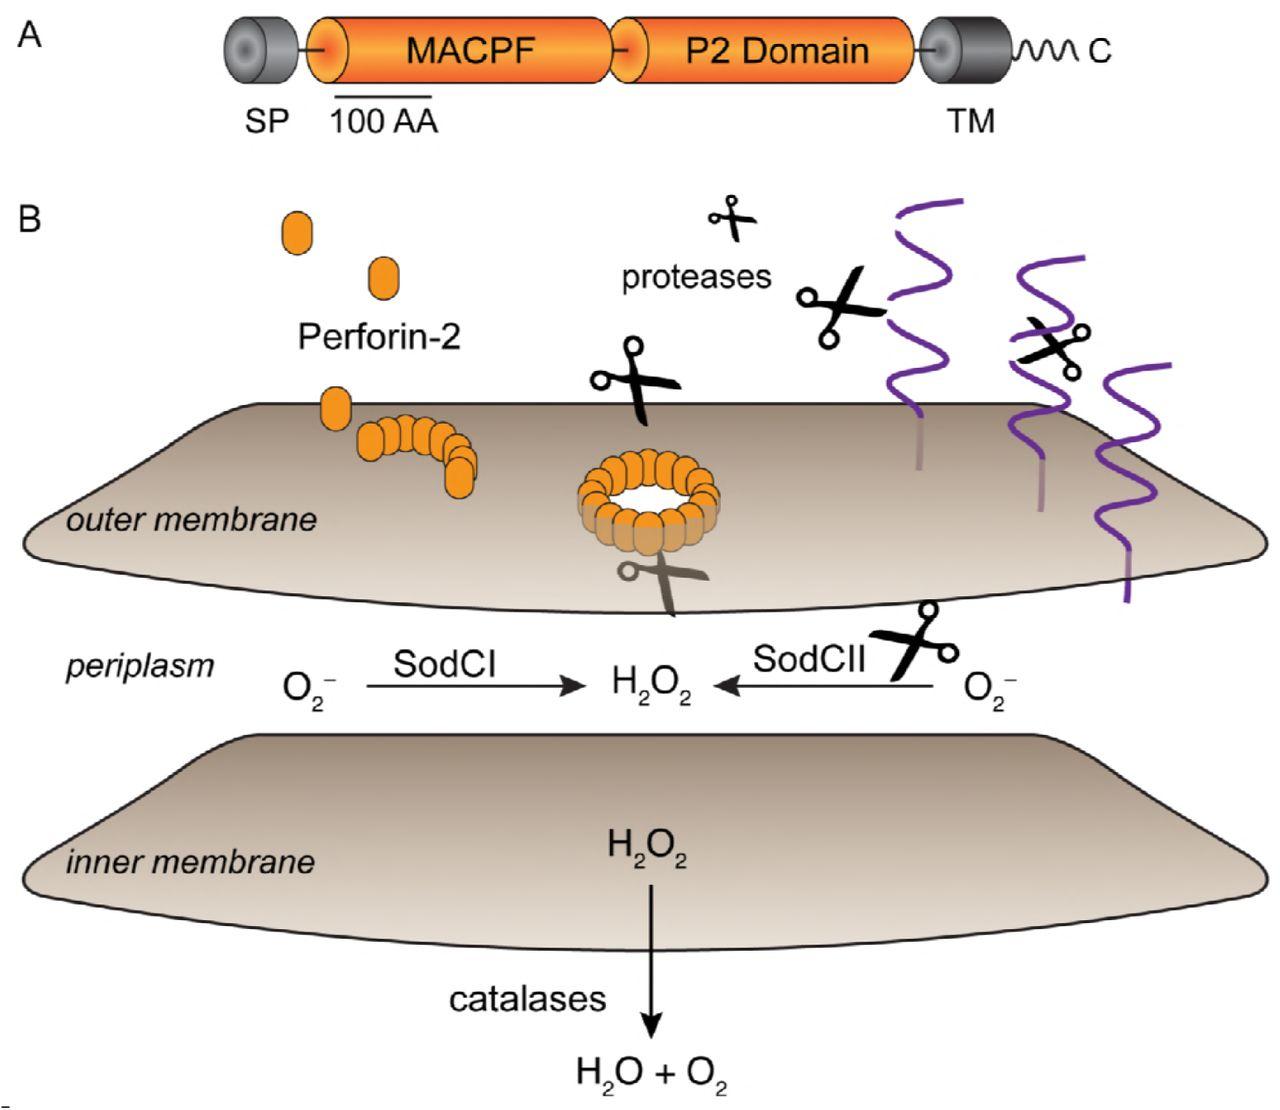 Perforin-2 Permeabilizes the Envelope of Phagocytosed Bacteria | bioRxiv